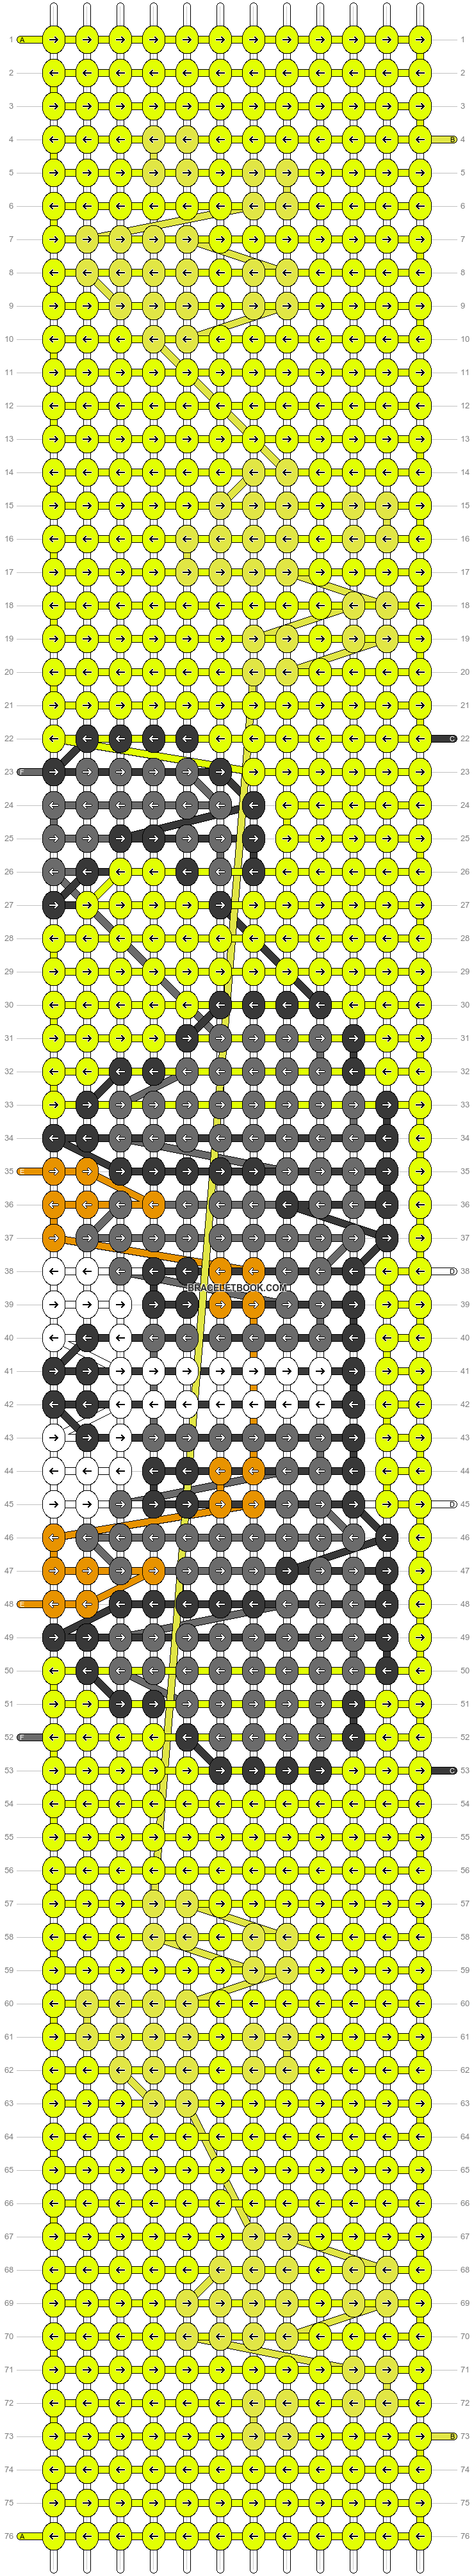 Alpha pattern #52628 variation #86038 pattern